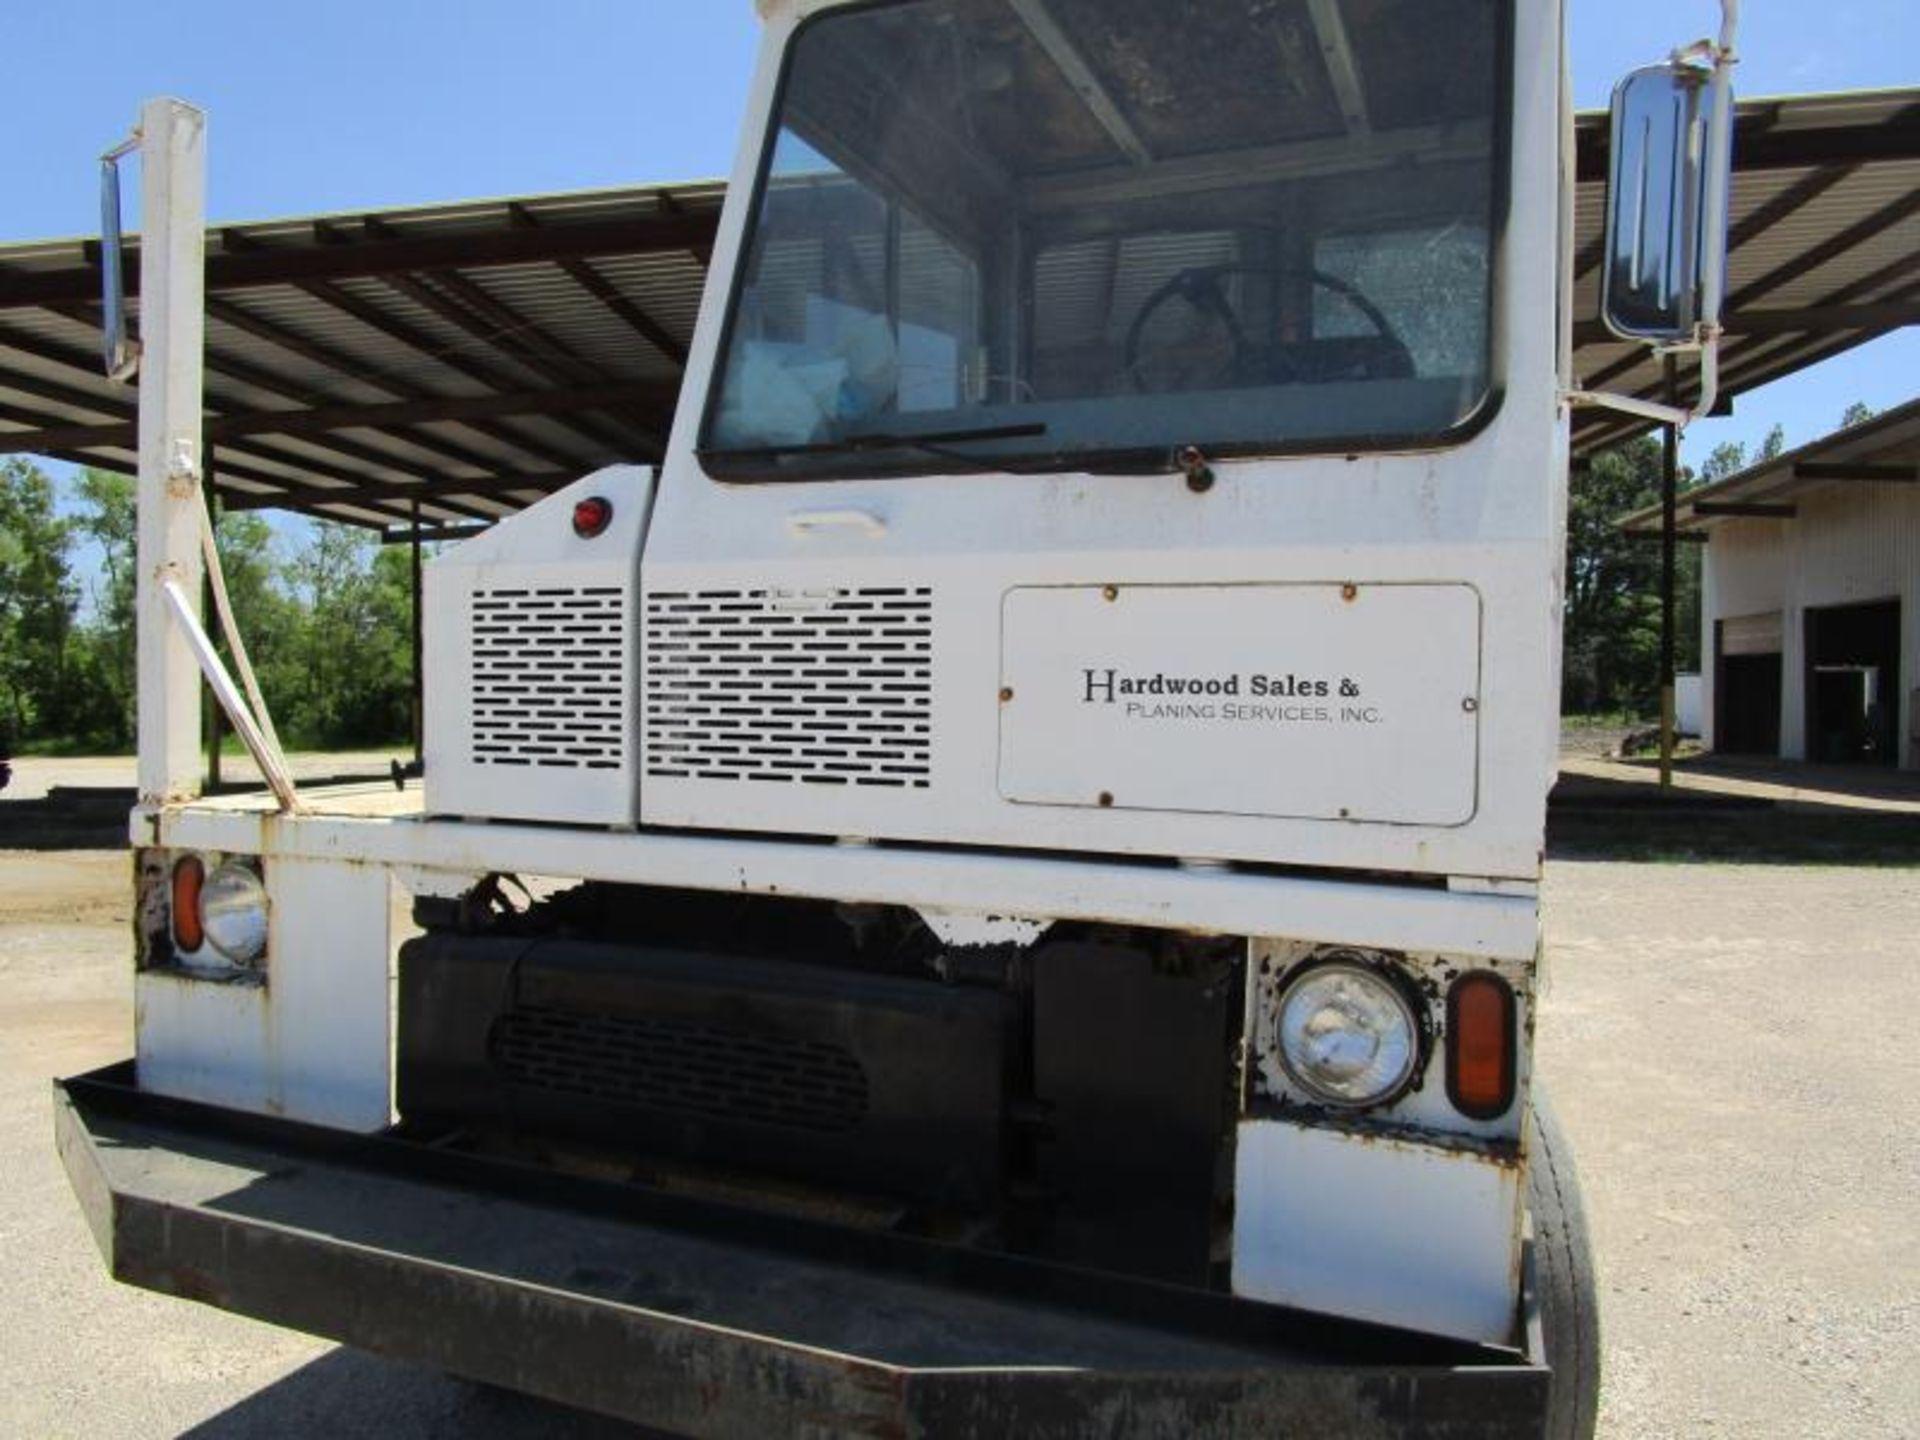 Yard truck by Ottawa truck model# 30 SN: 65044390 engine hours 8,164 - Image 2 of 8